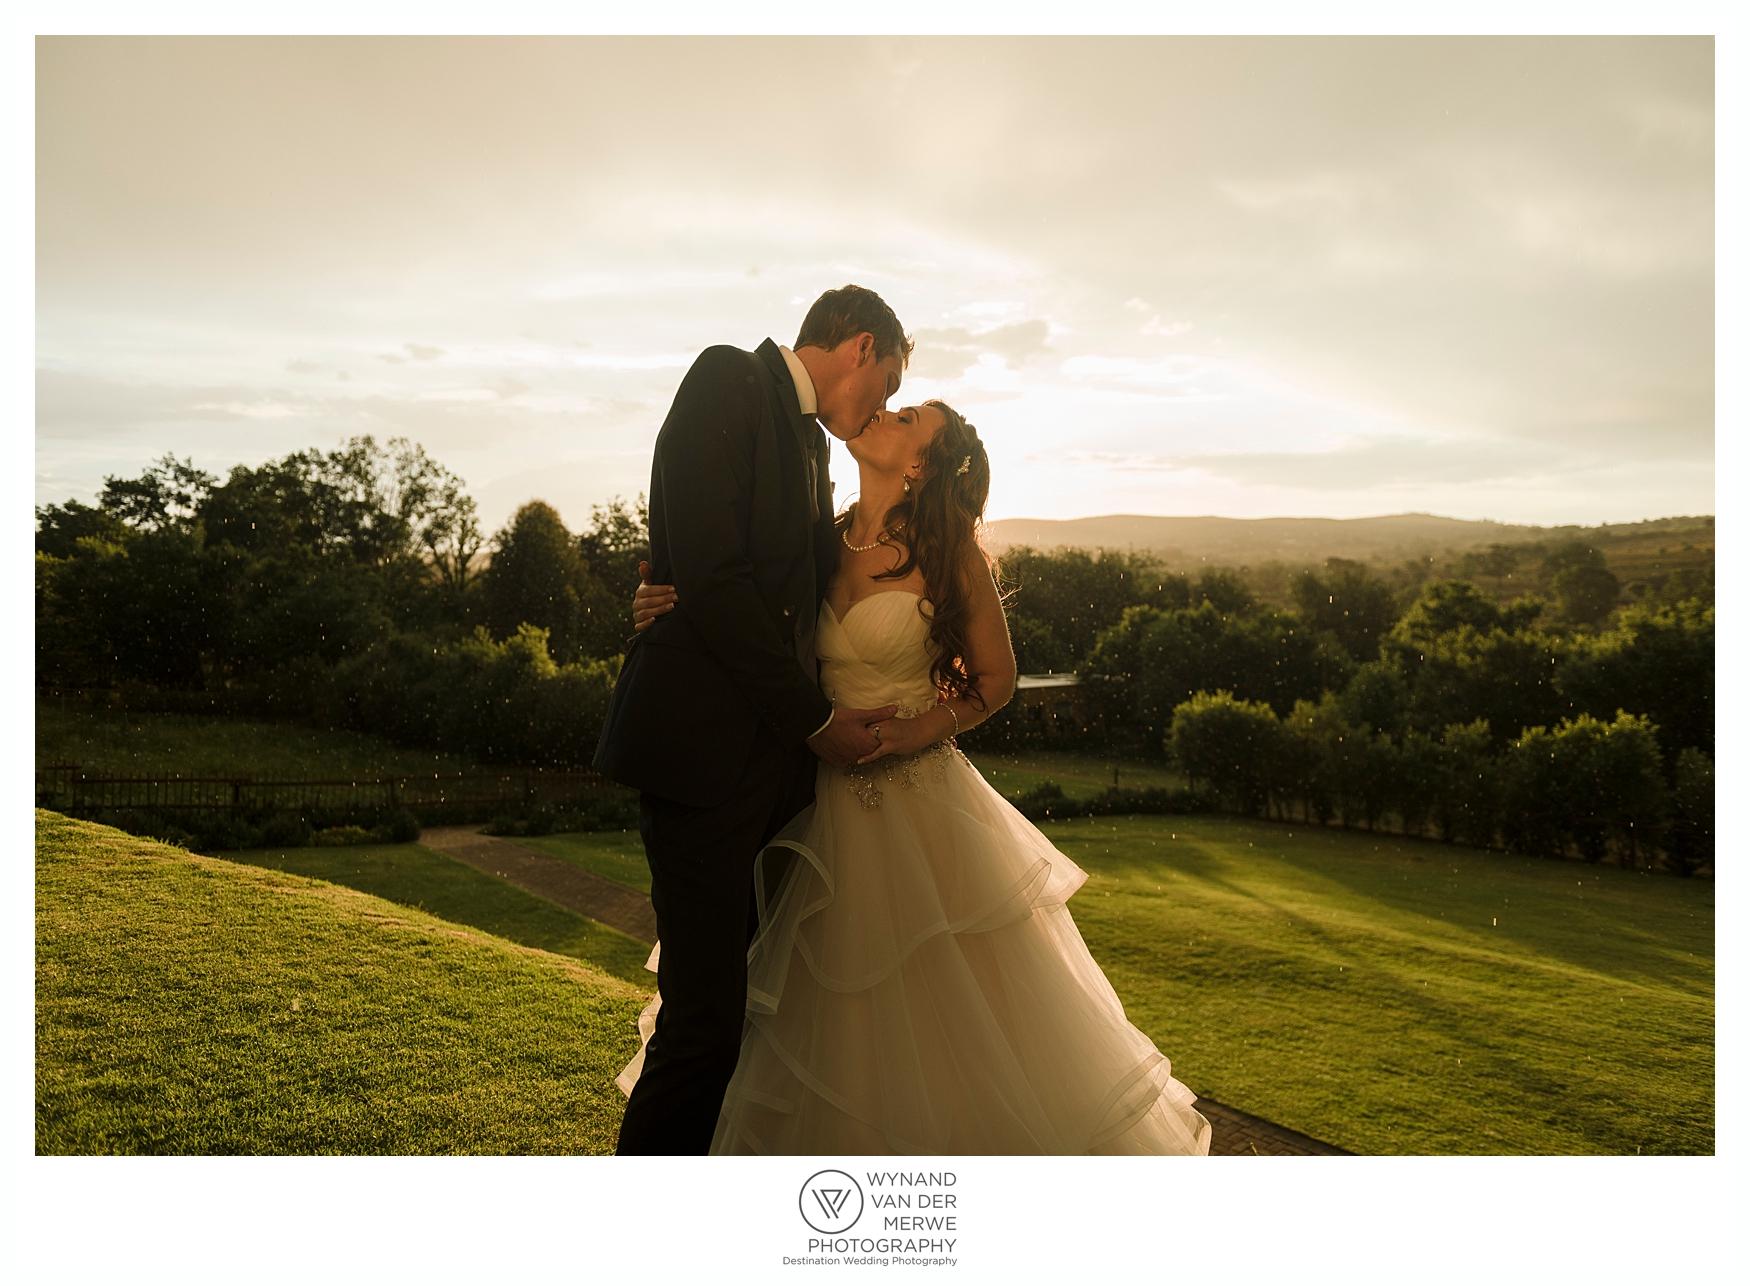 Wynandvandermerwe ryan natalia wedding photography cradle valley guesthouse gauteng-483.jpg